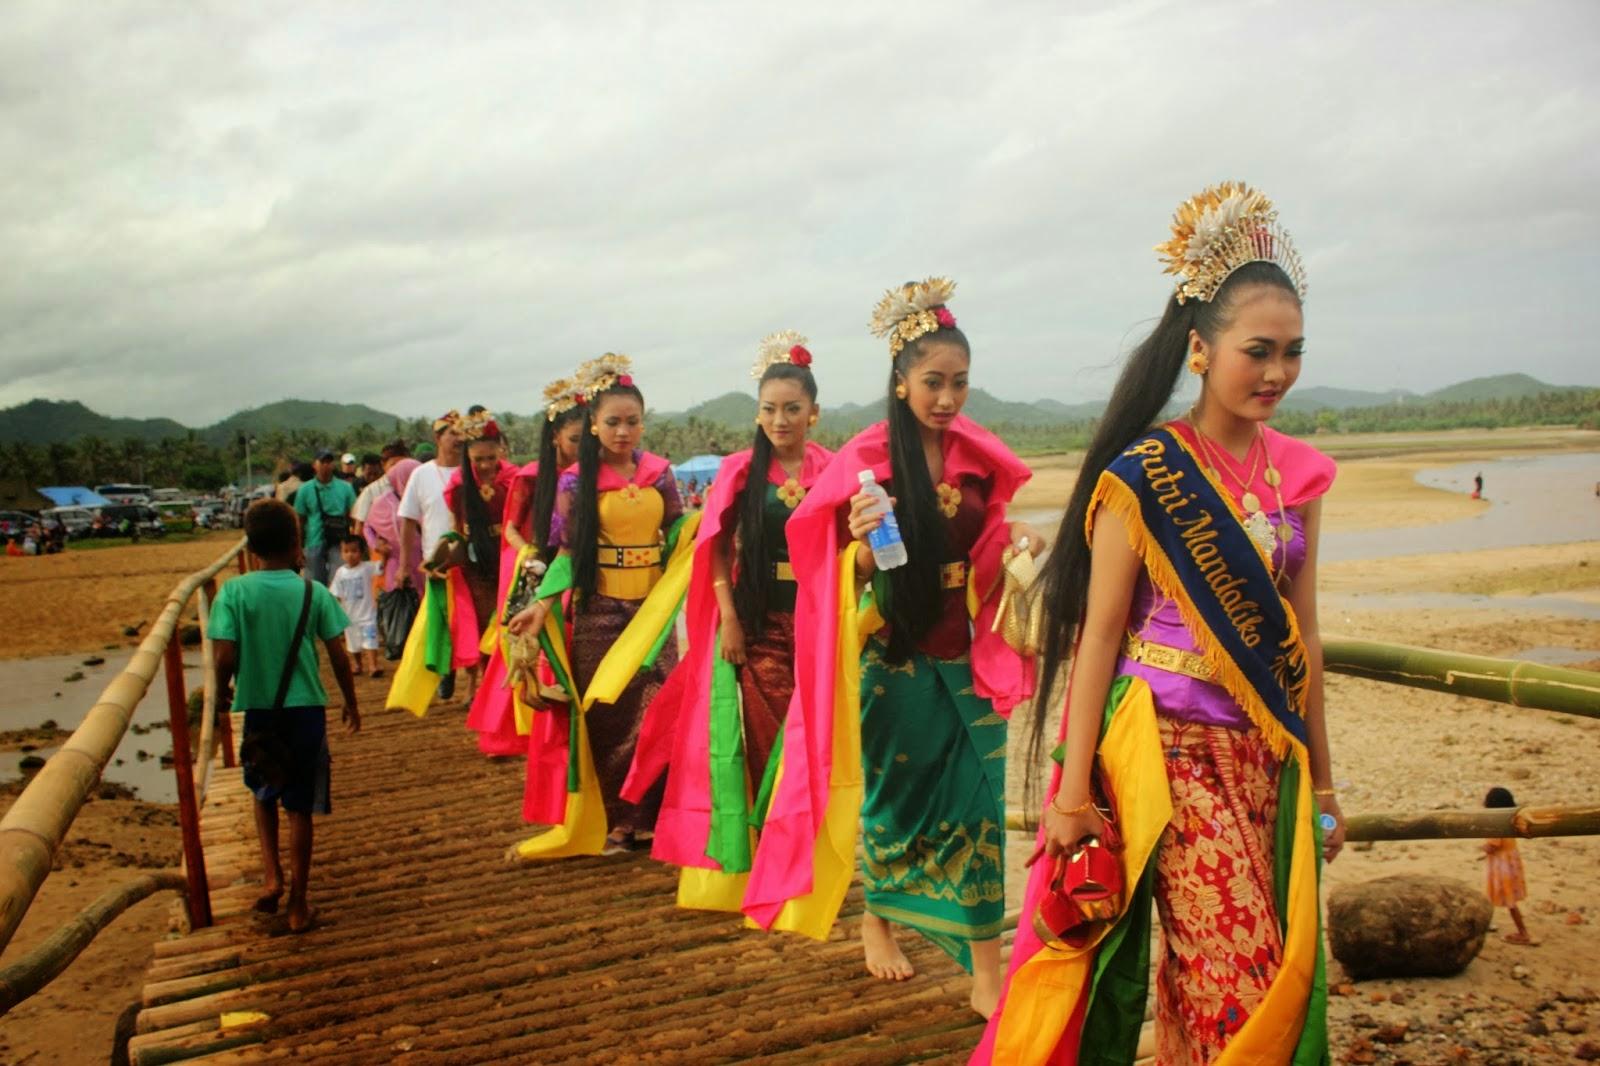 Lomba pemilihan putri Mandalika di Lombok Indonesia